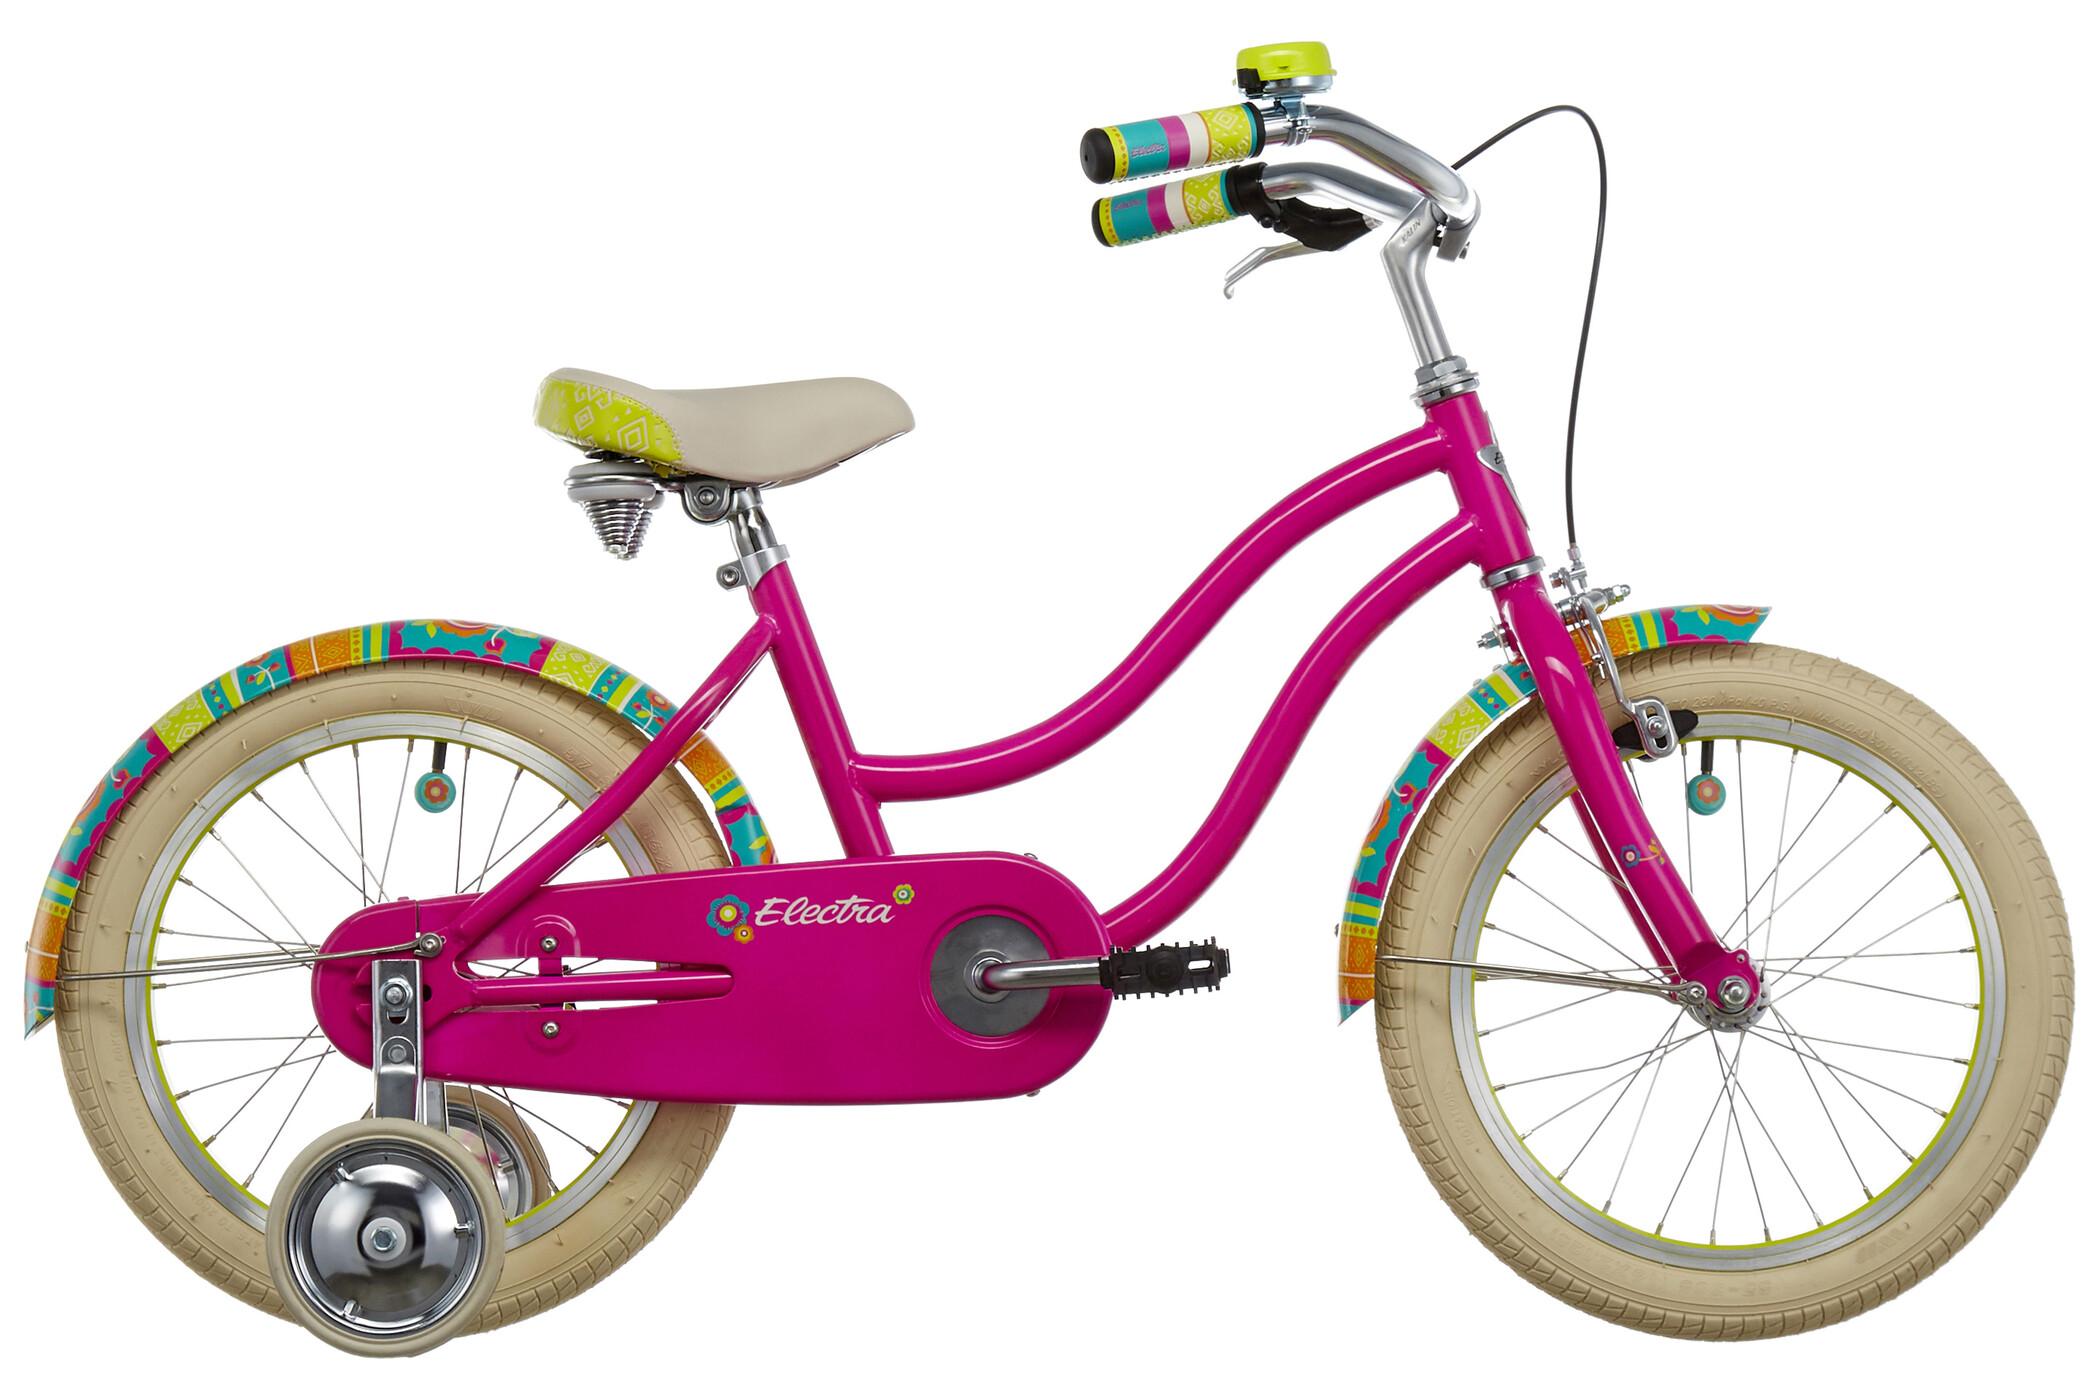 Electra Lotus 1 Piger, bright pink | City-cykler